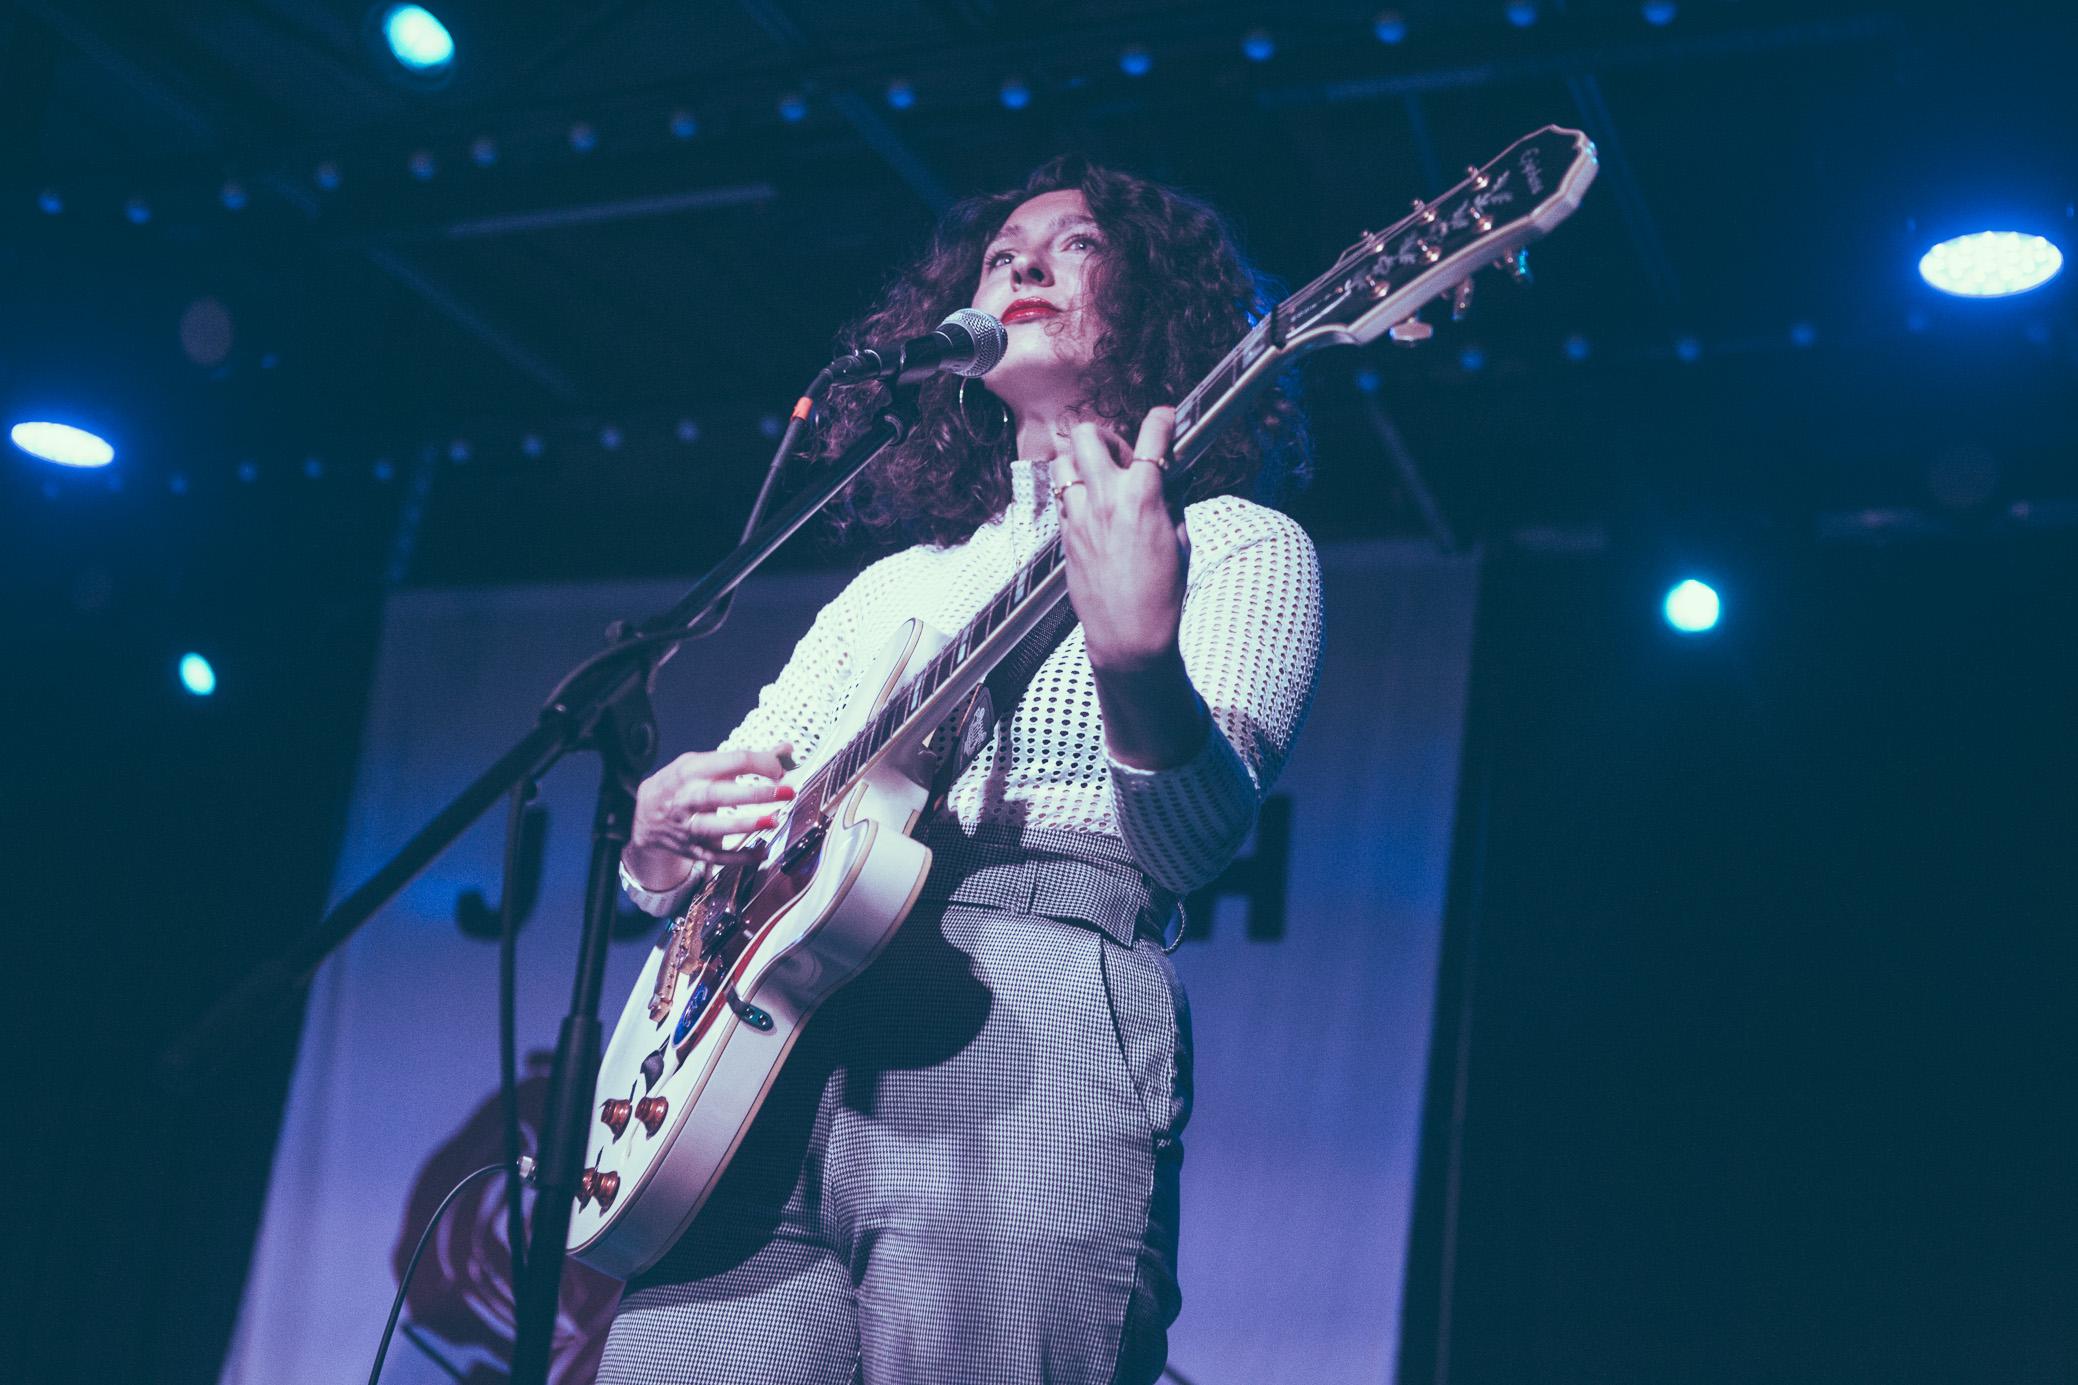 Natalie Closner of Joseph performs in concert at Saturn Birmingham in Birmingham, Alabama on September 6th, 2018. (Photo by David A. Smith/DSmithScenes)